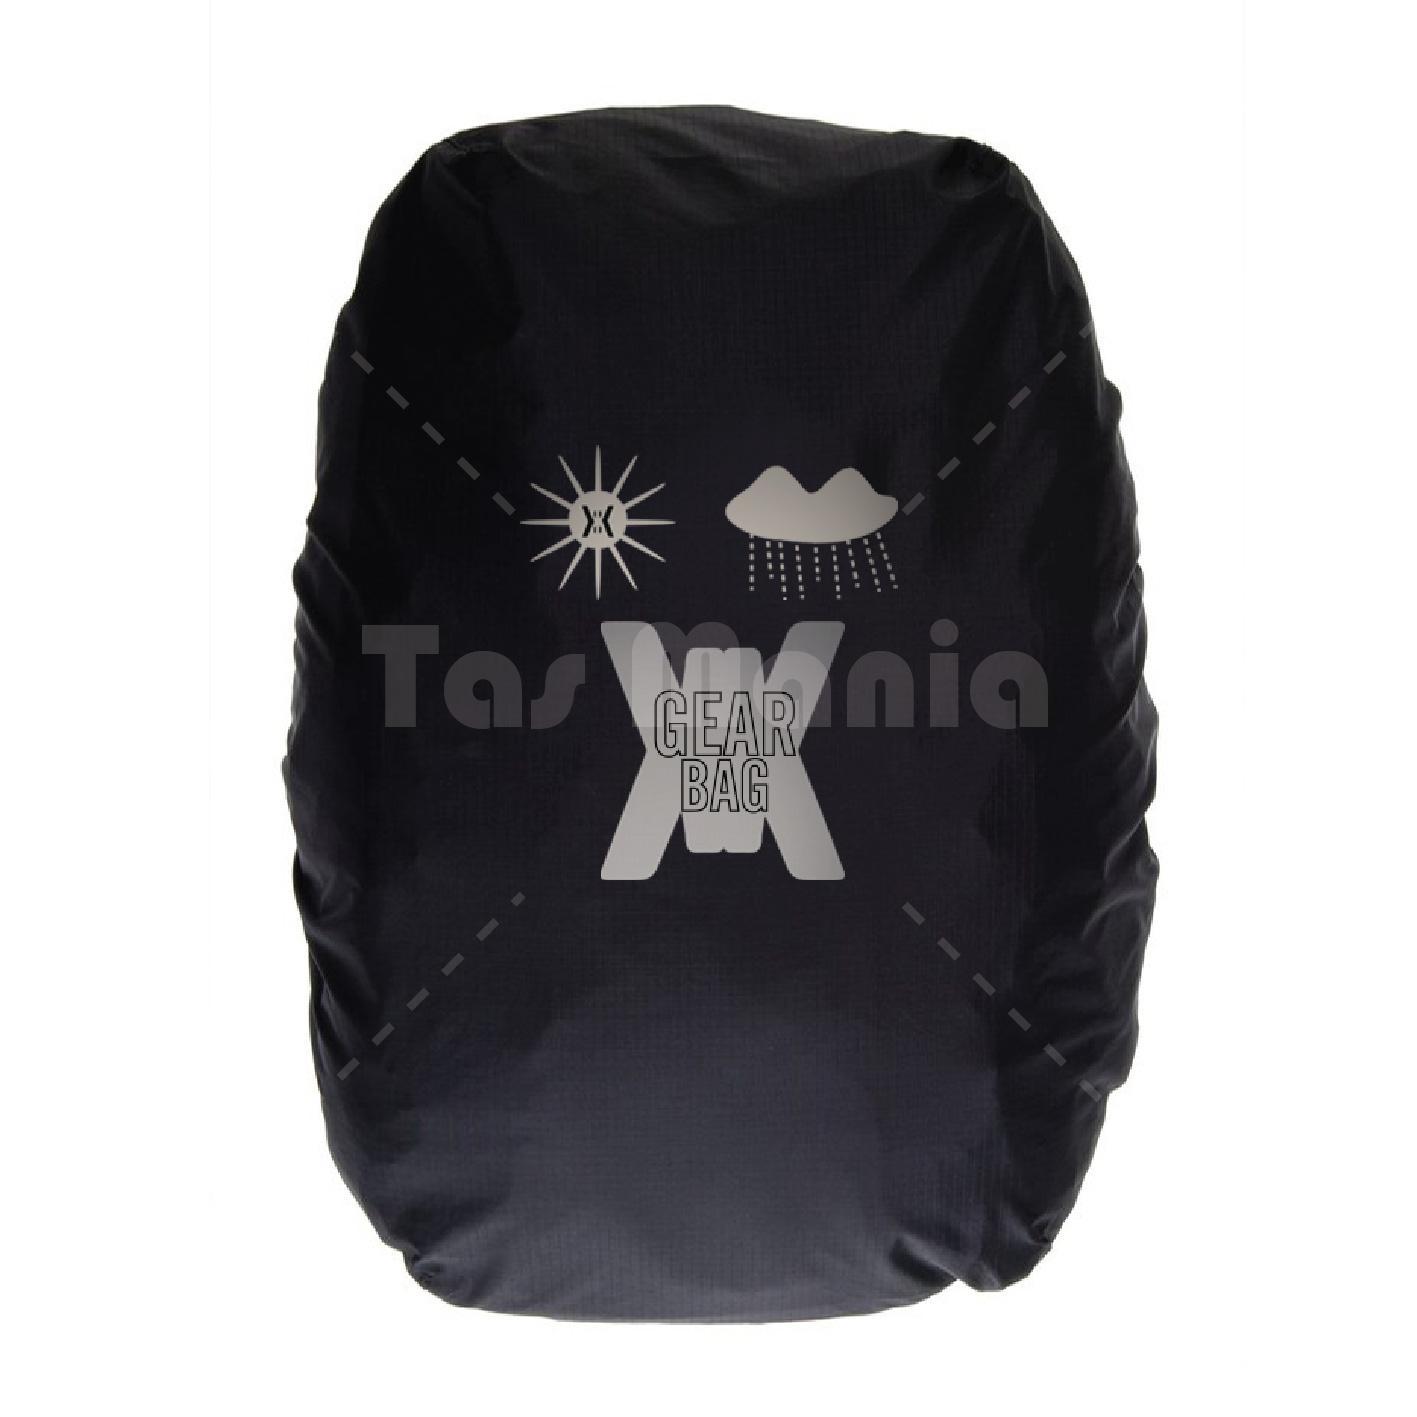 ... Tas Ransel Gear Bag Andromeda Tas Laptop Backpack - Silver Black S2 + Raincover + FREE